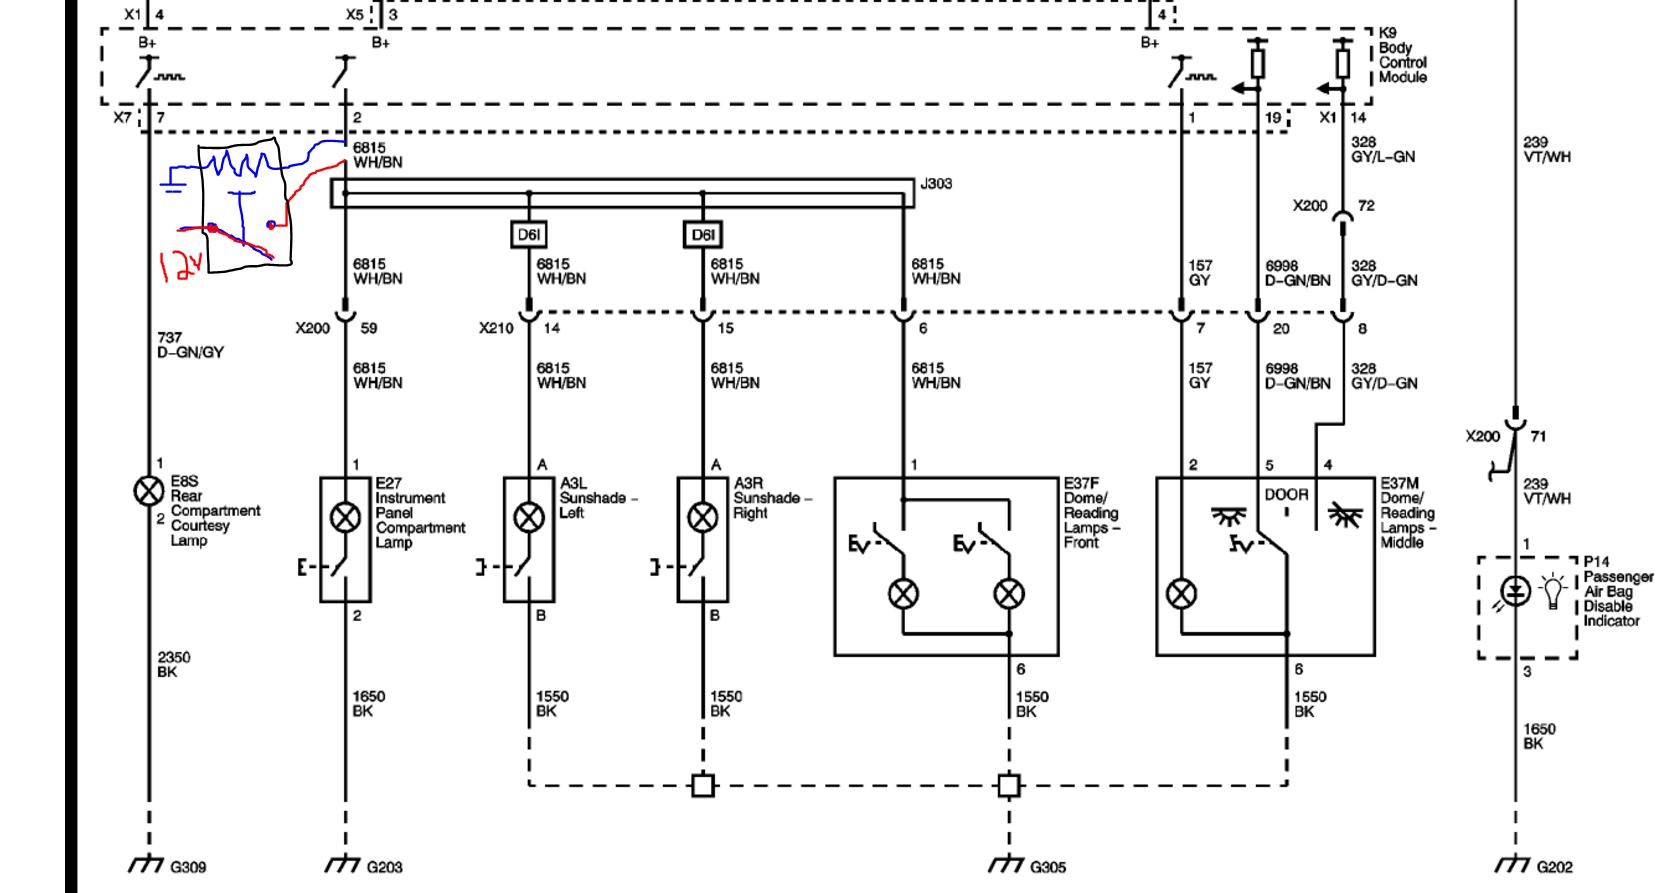 Alarm System Wiring Diagram 2012 Chevy Cruze